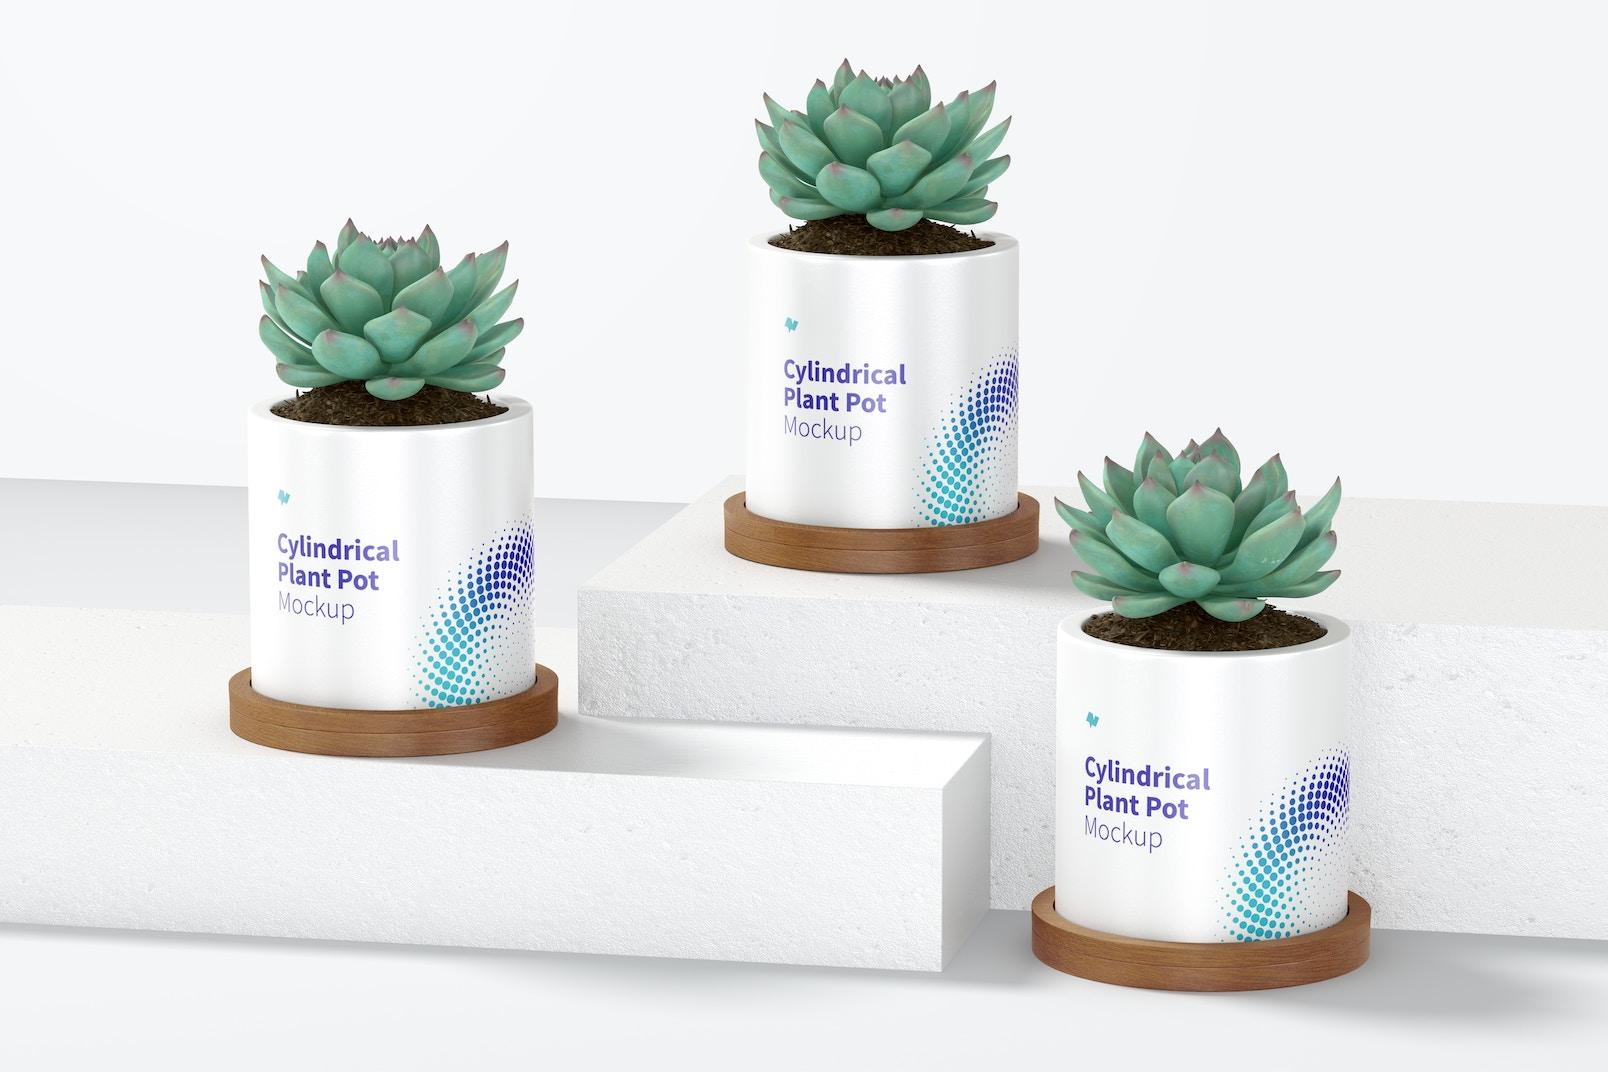 Ceramic Cylindrical Plant Pot Set Mockup